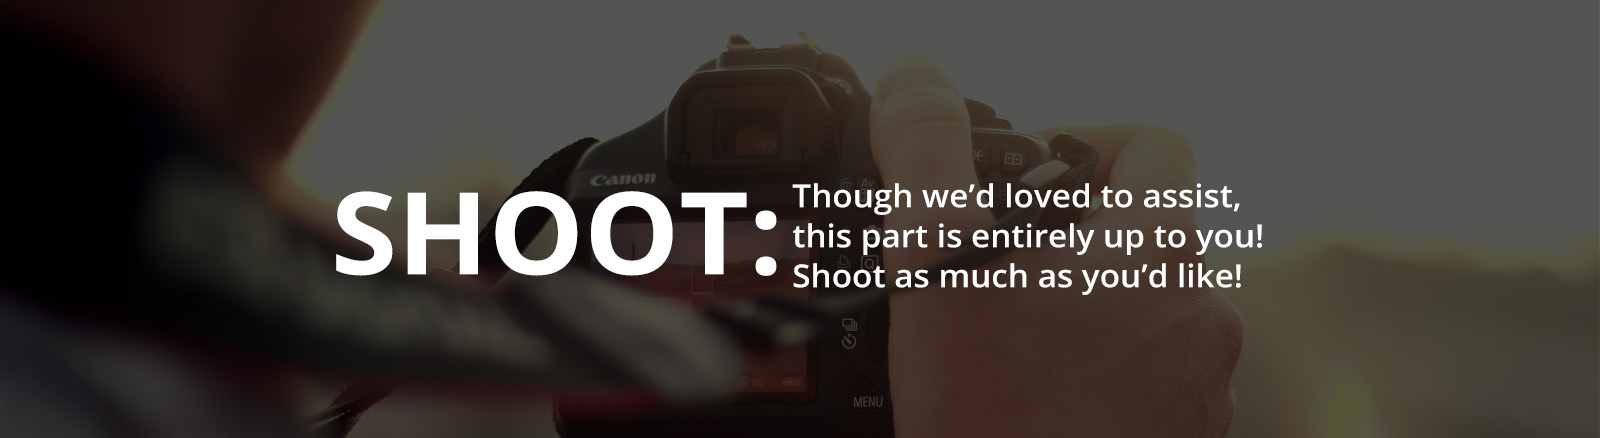 LensProToGo - How It Works - SHOOT